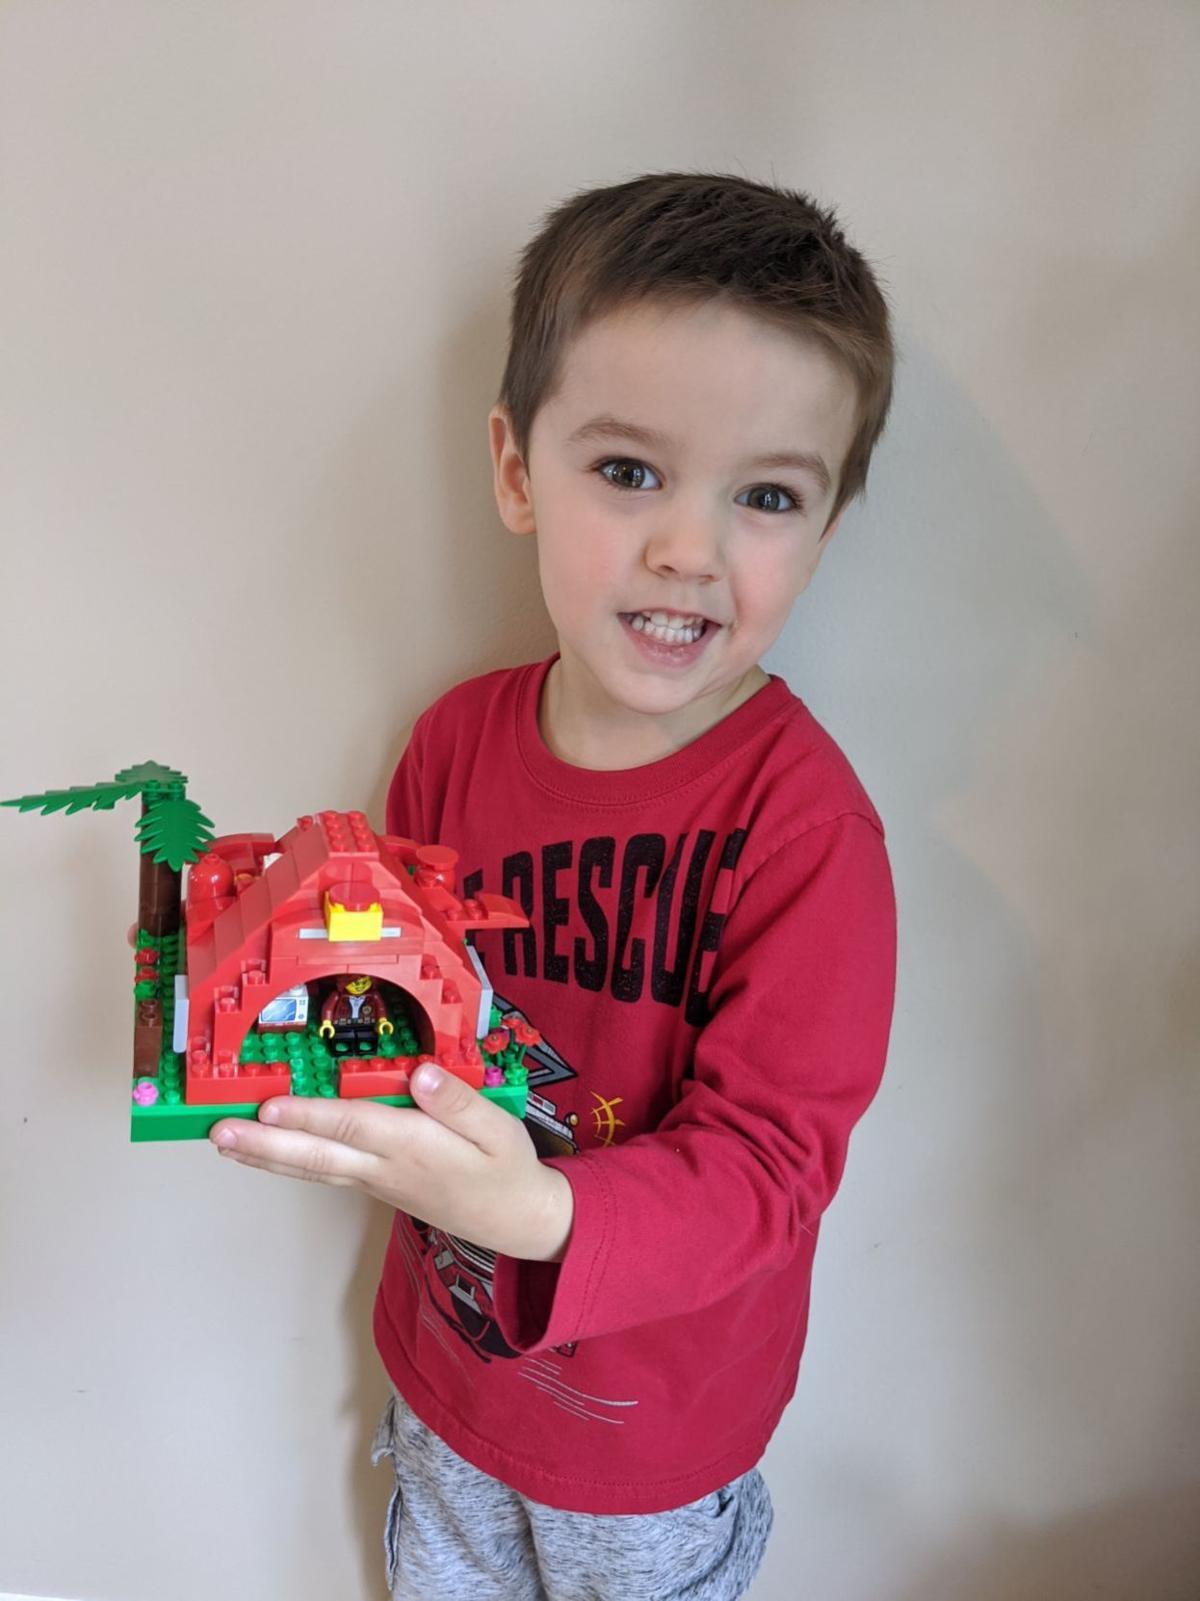 lego 3-5 Year Old Winner_Caedmon Age 3.jpg